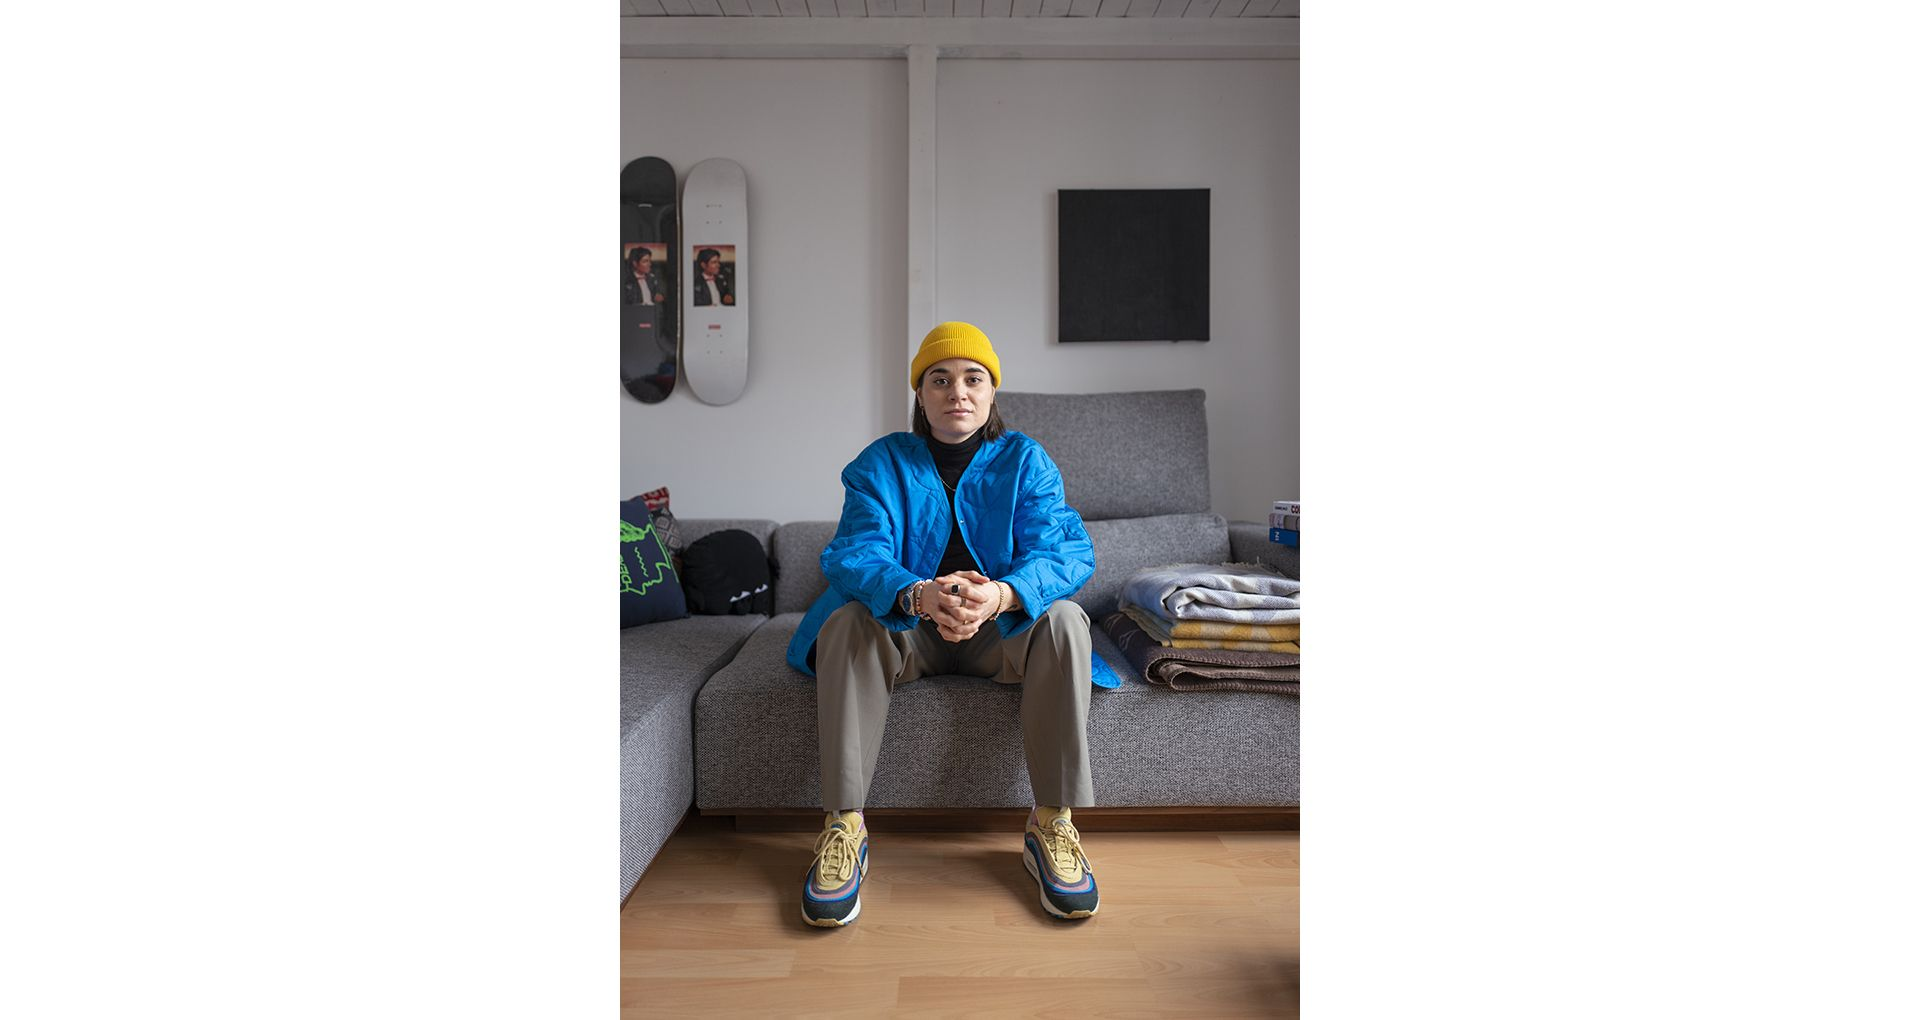 Nike Air Max 97 Sean Wotherspoon   Skor, Mode och Kläder